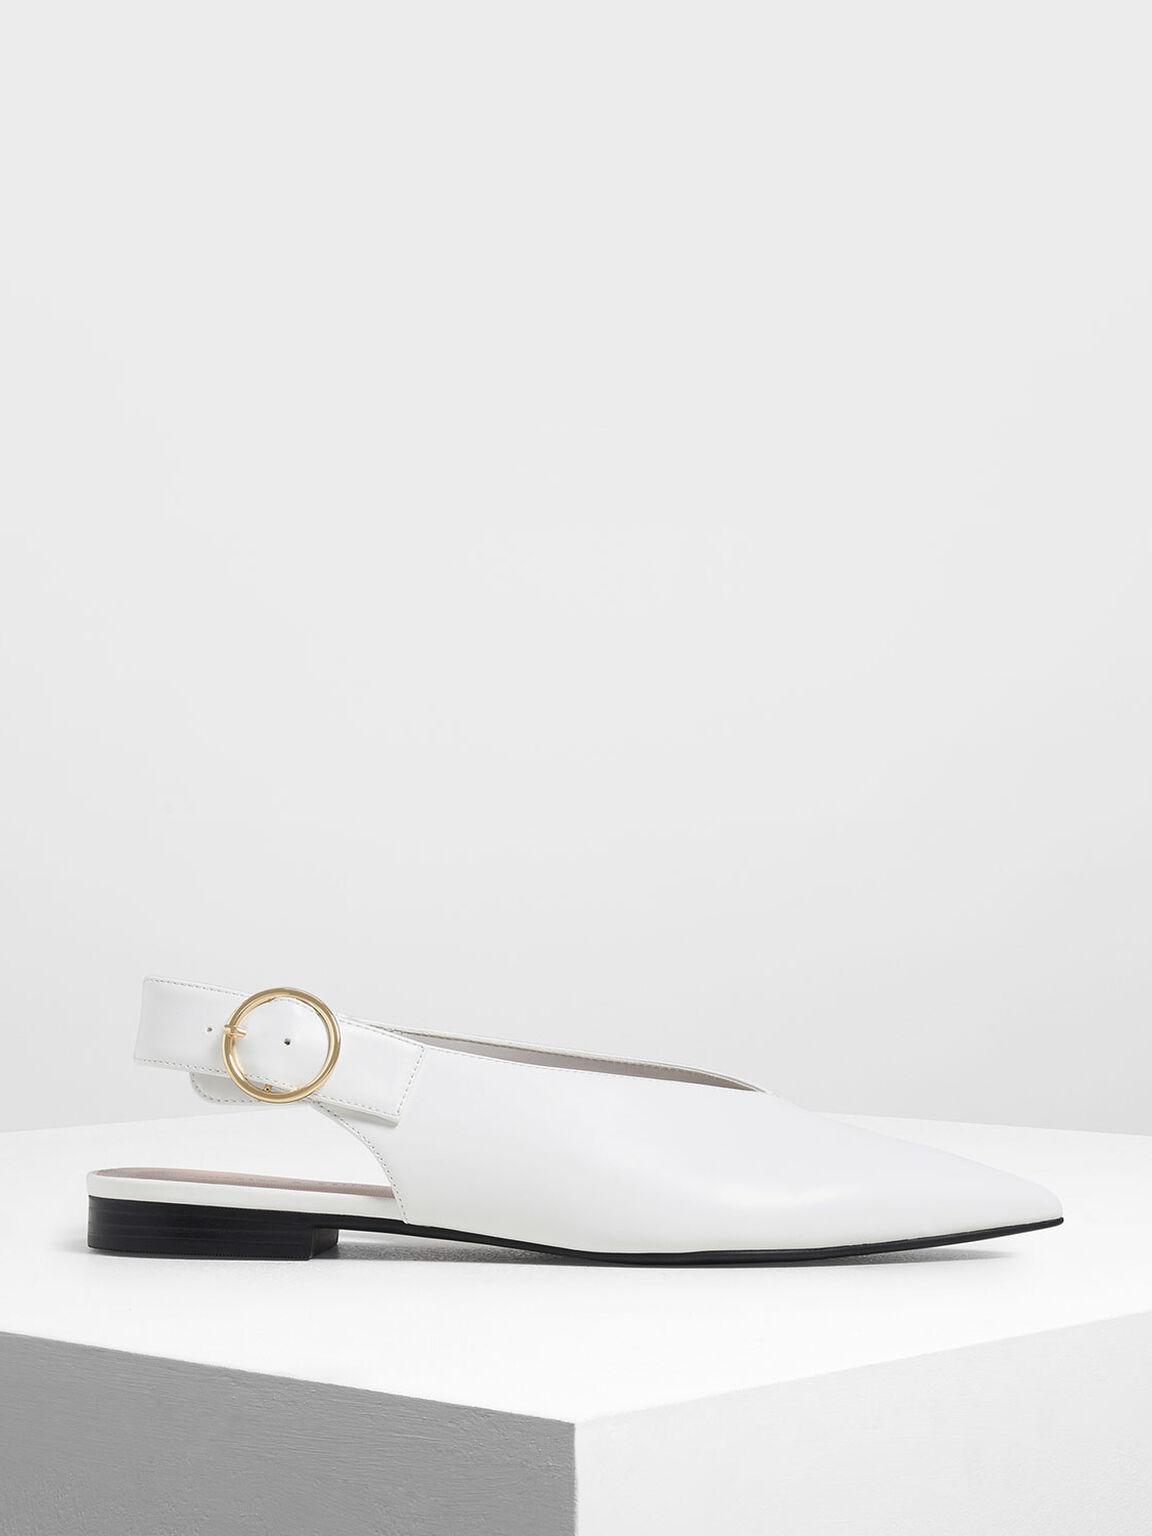 V-Cut Slingback Flats, White, hi-res